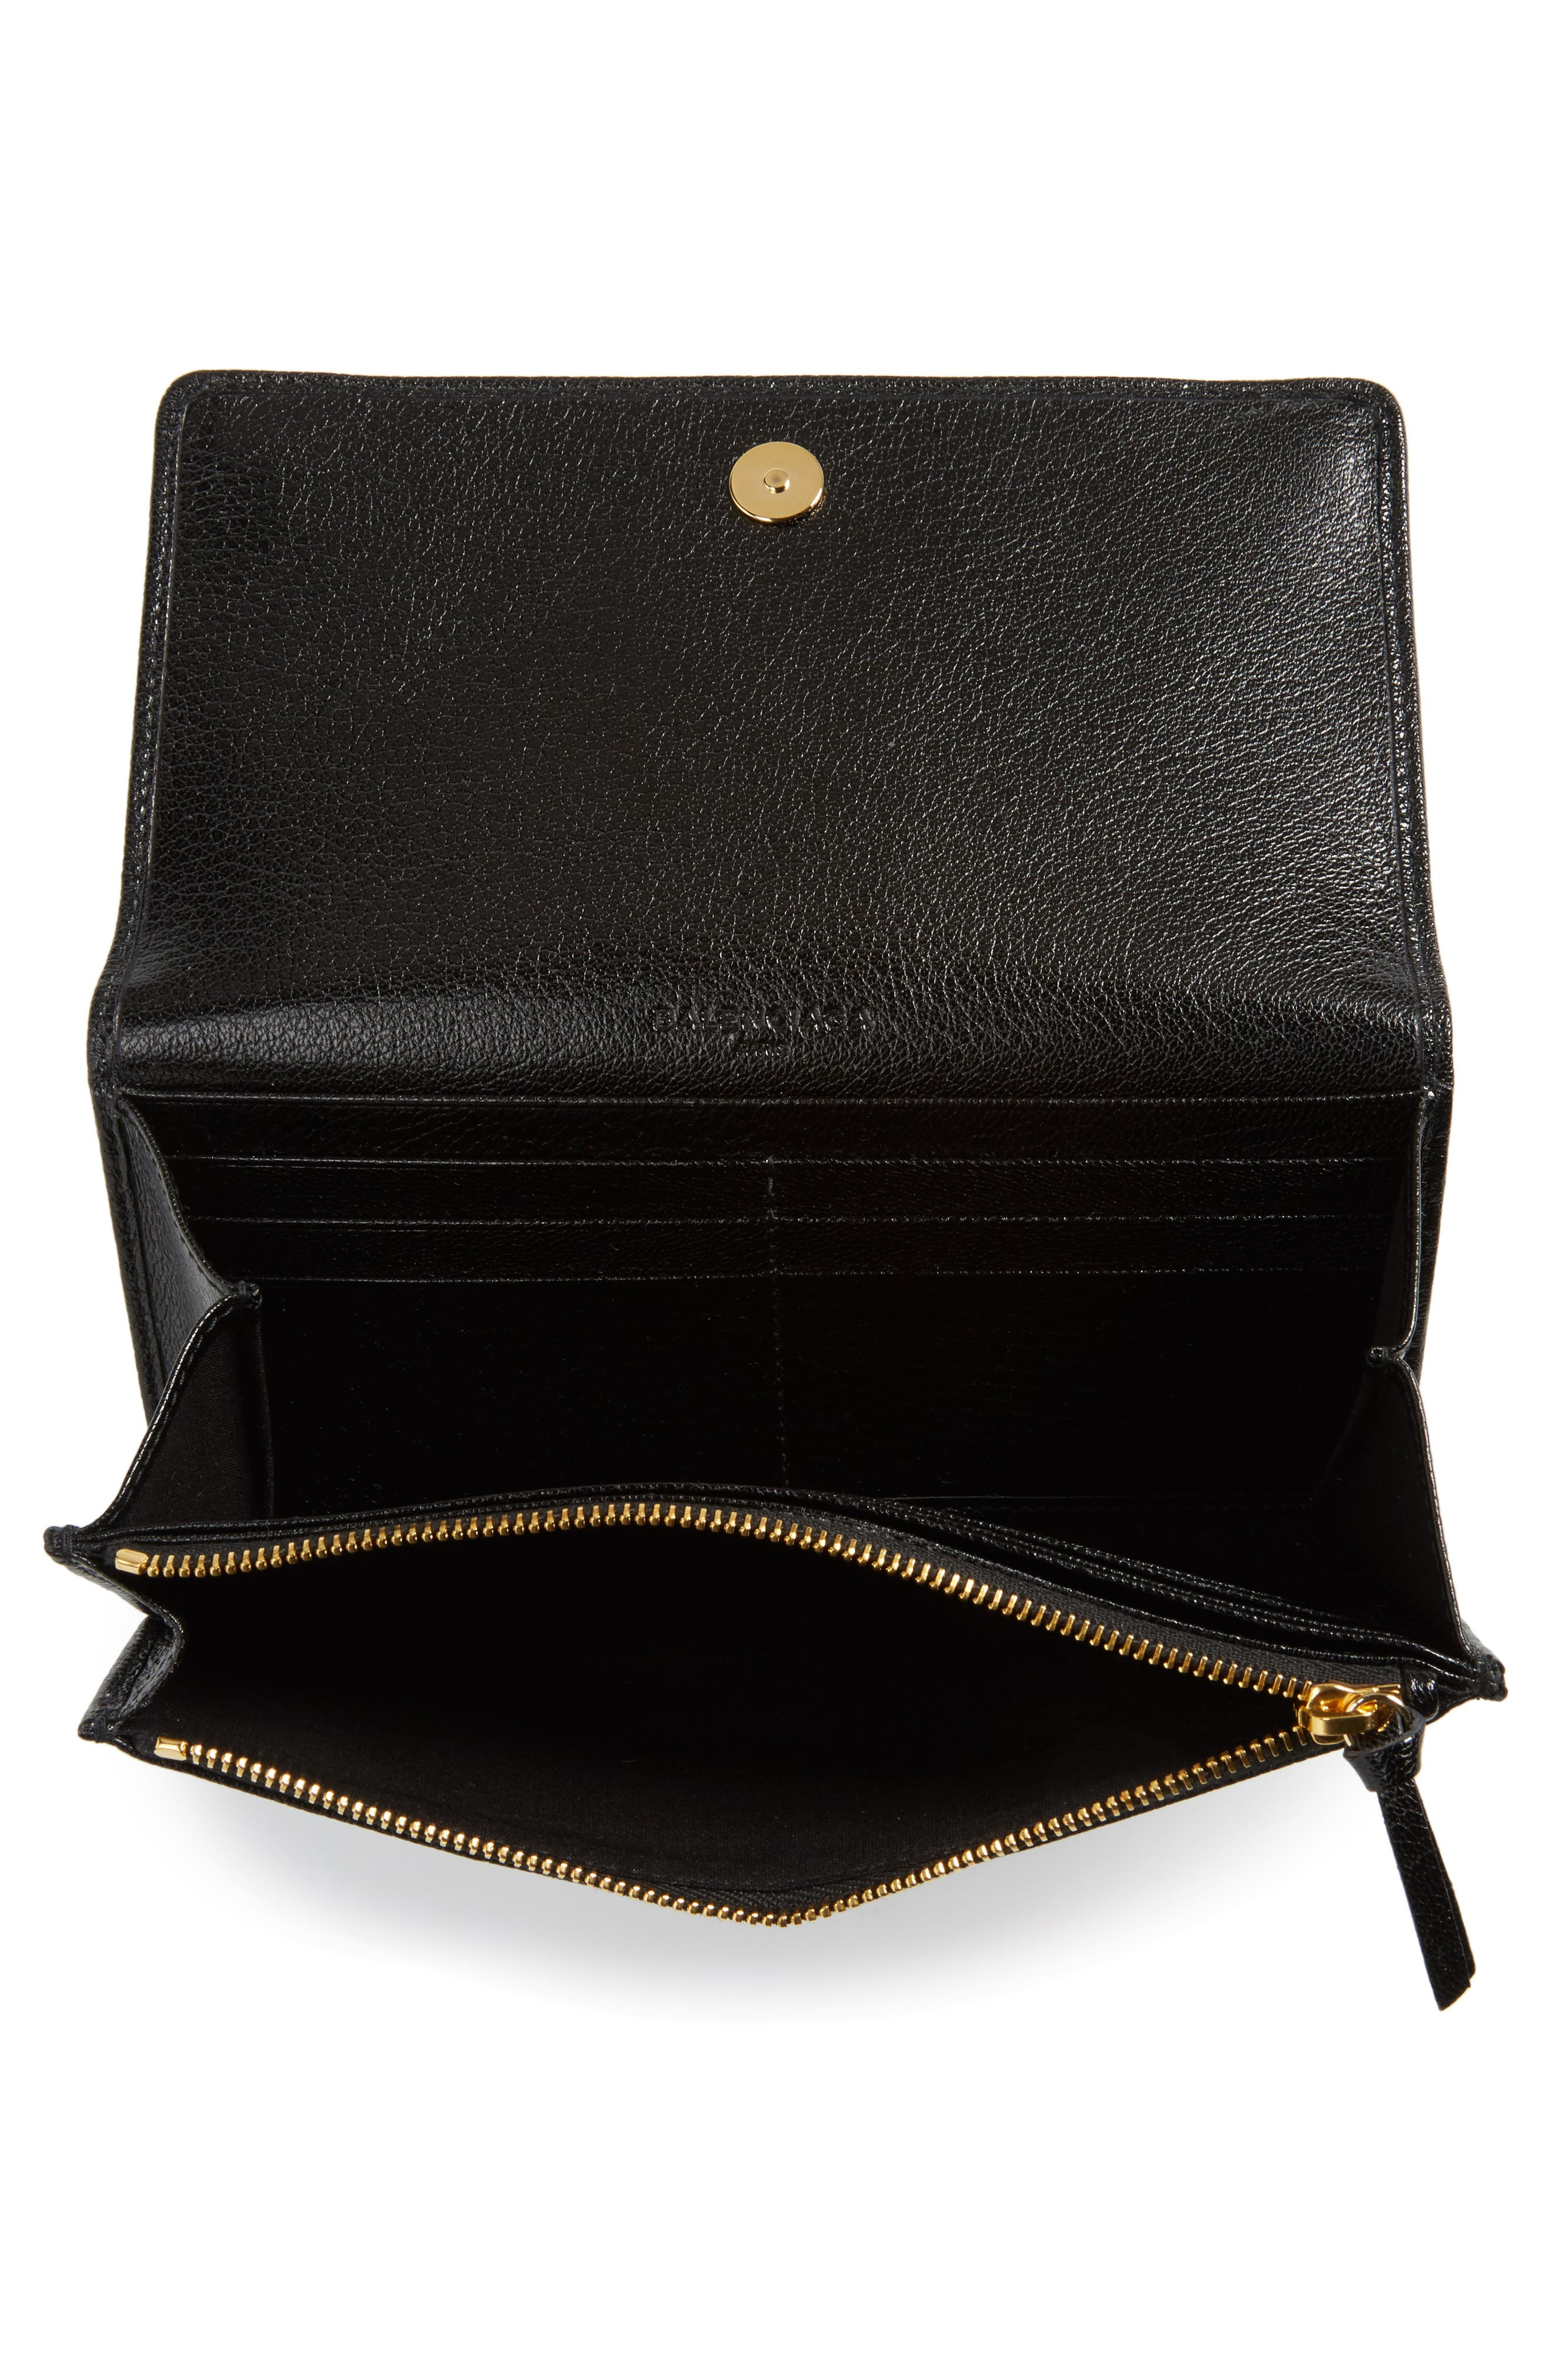 Metallic Edge Leather Wallet,                             Alternate thumbnail 2, color,                             Noir